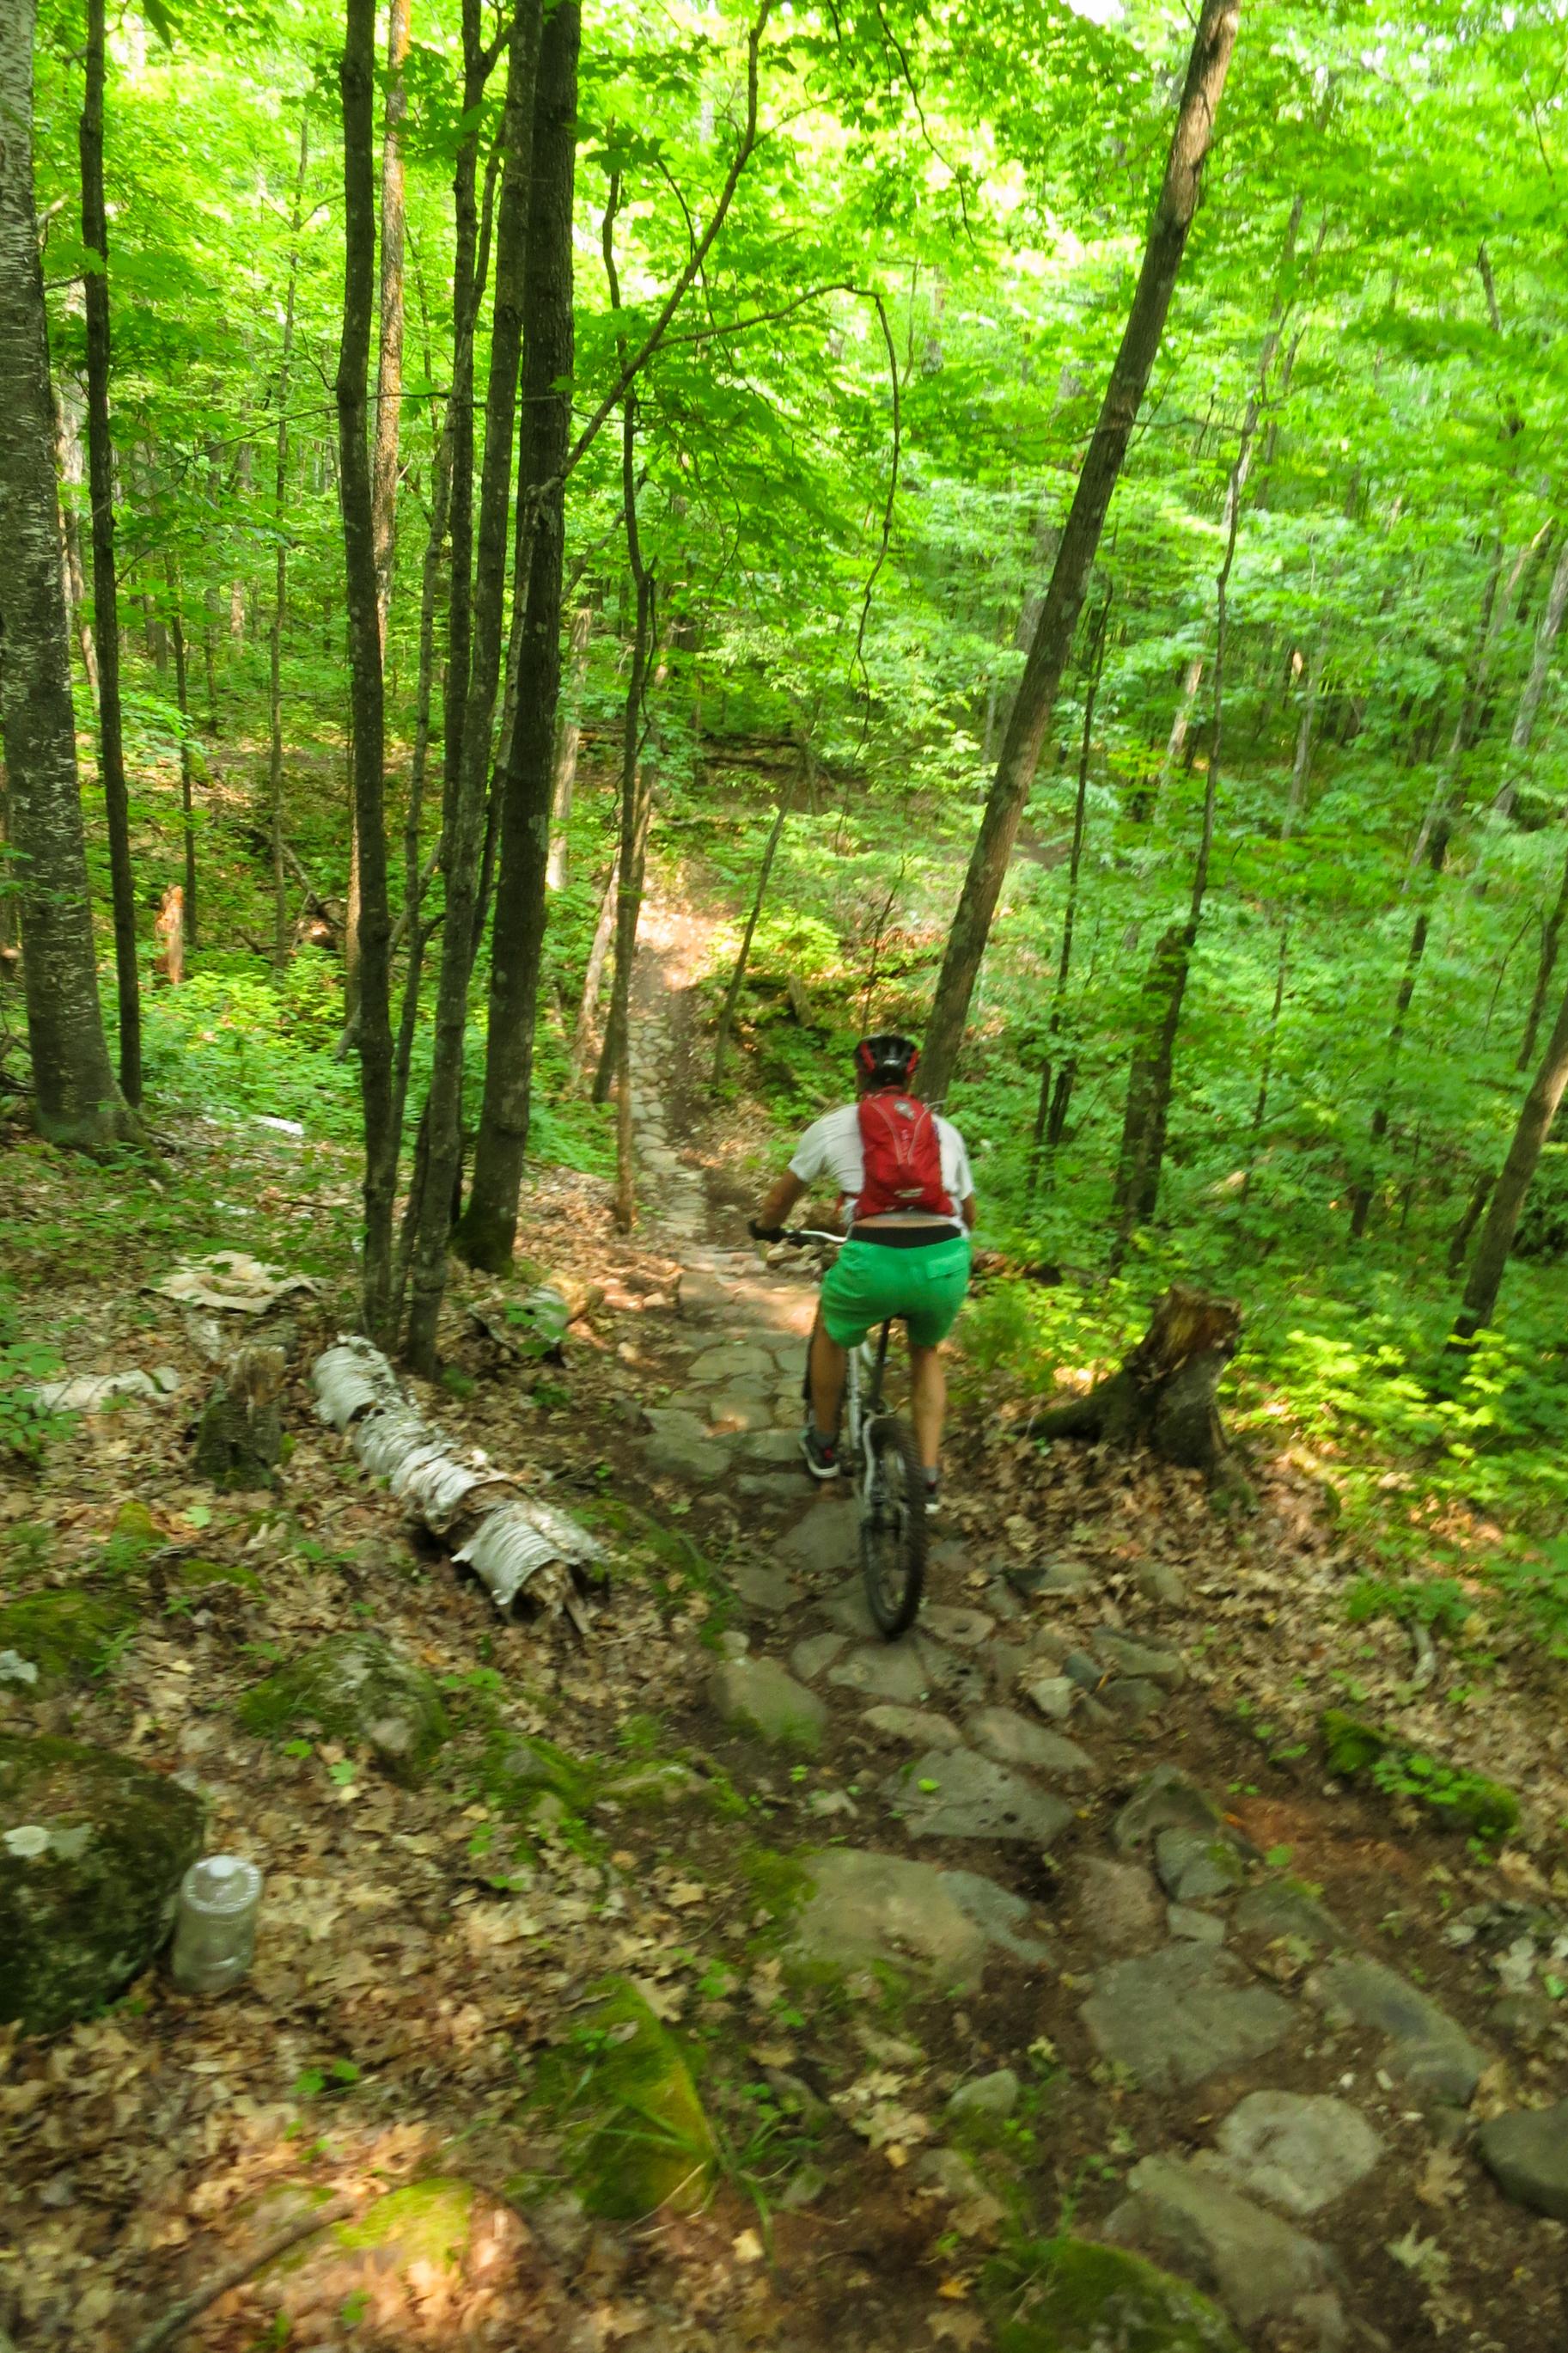 Mountain biking wisconsin outdoor fun adventure